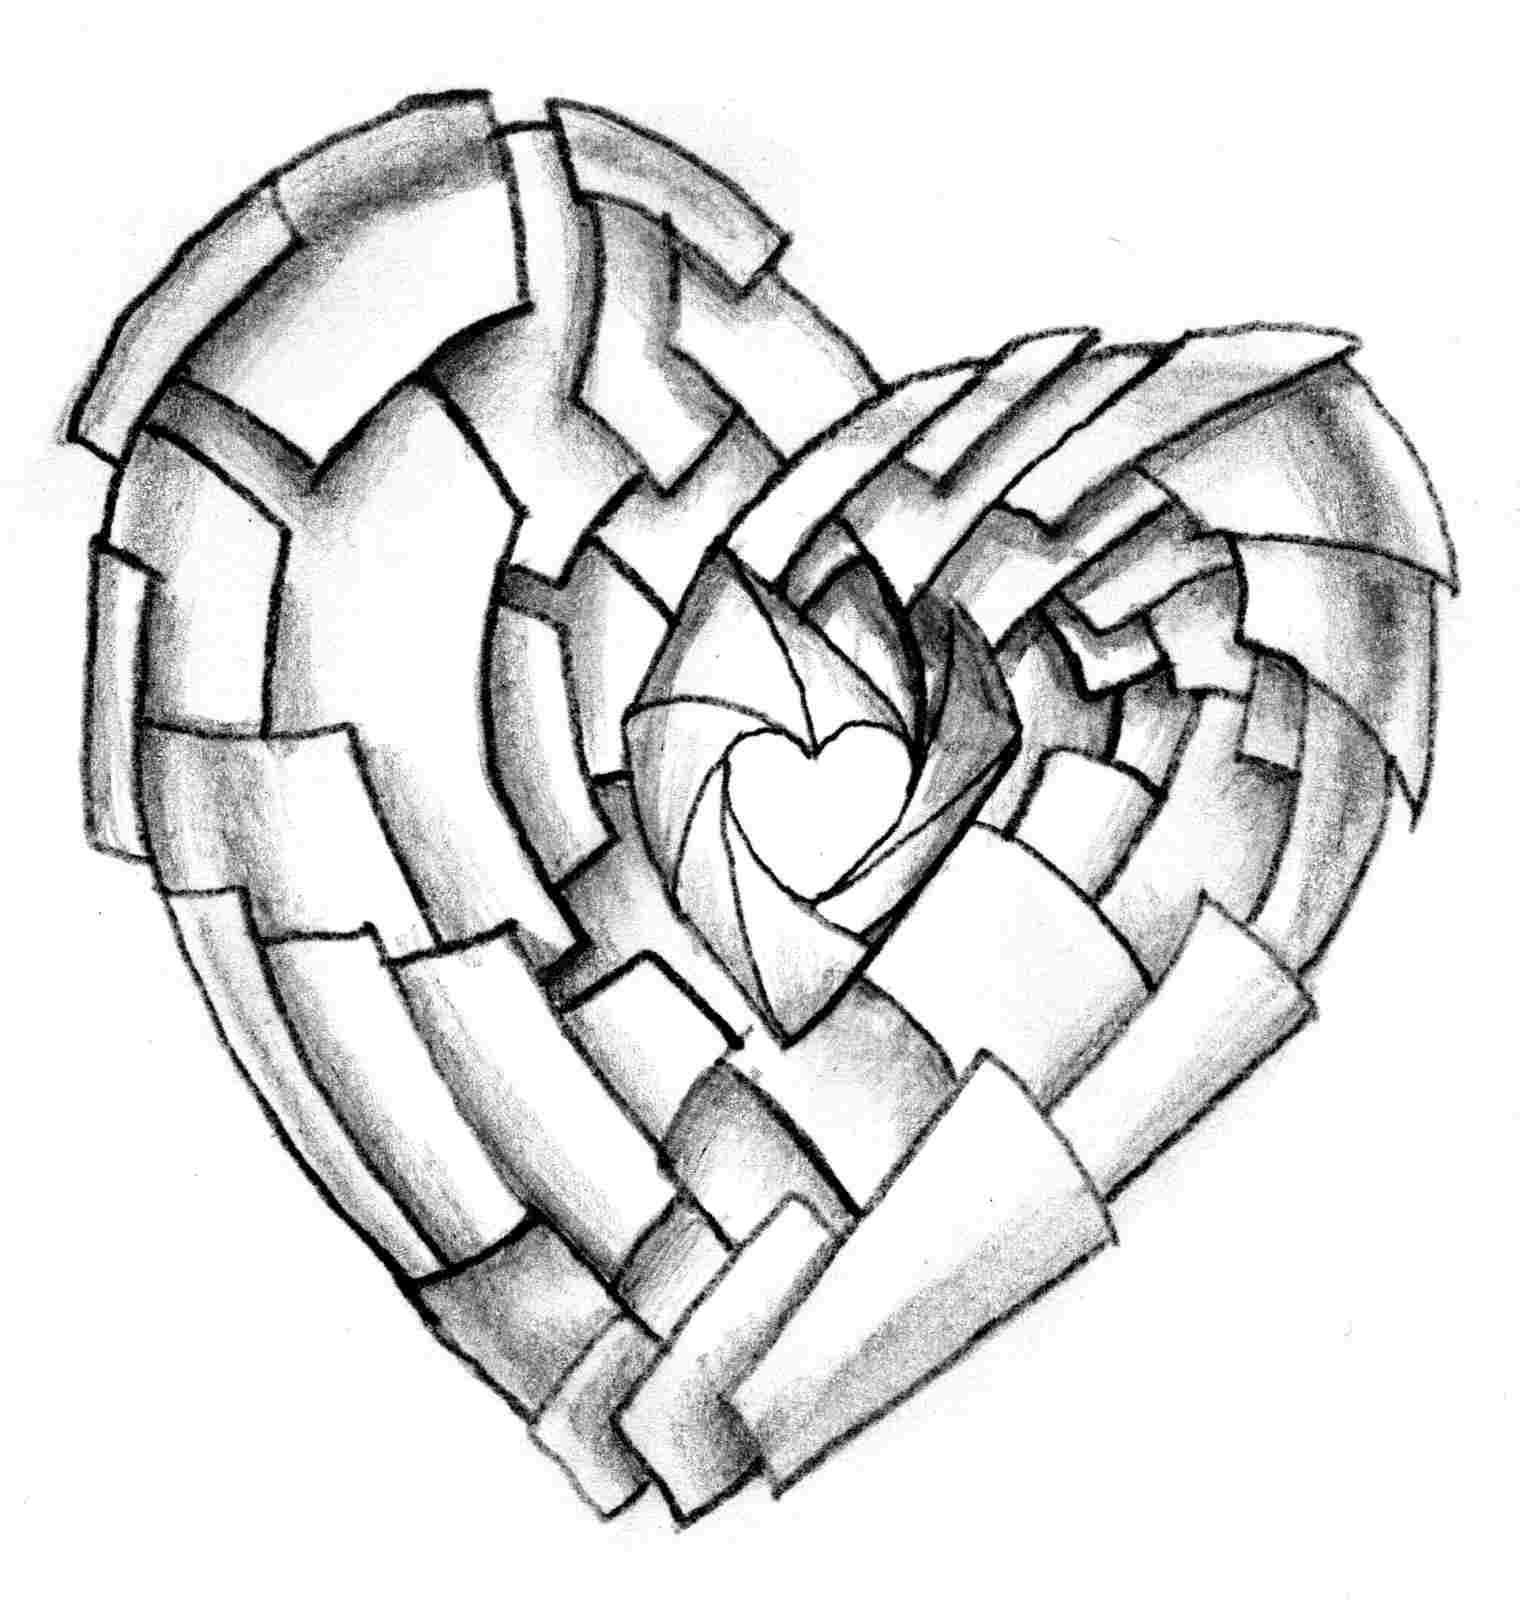 1531x1618 Pencil Sketch Of Human Heart